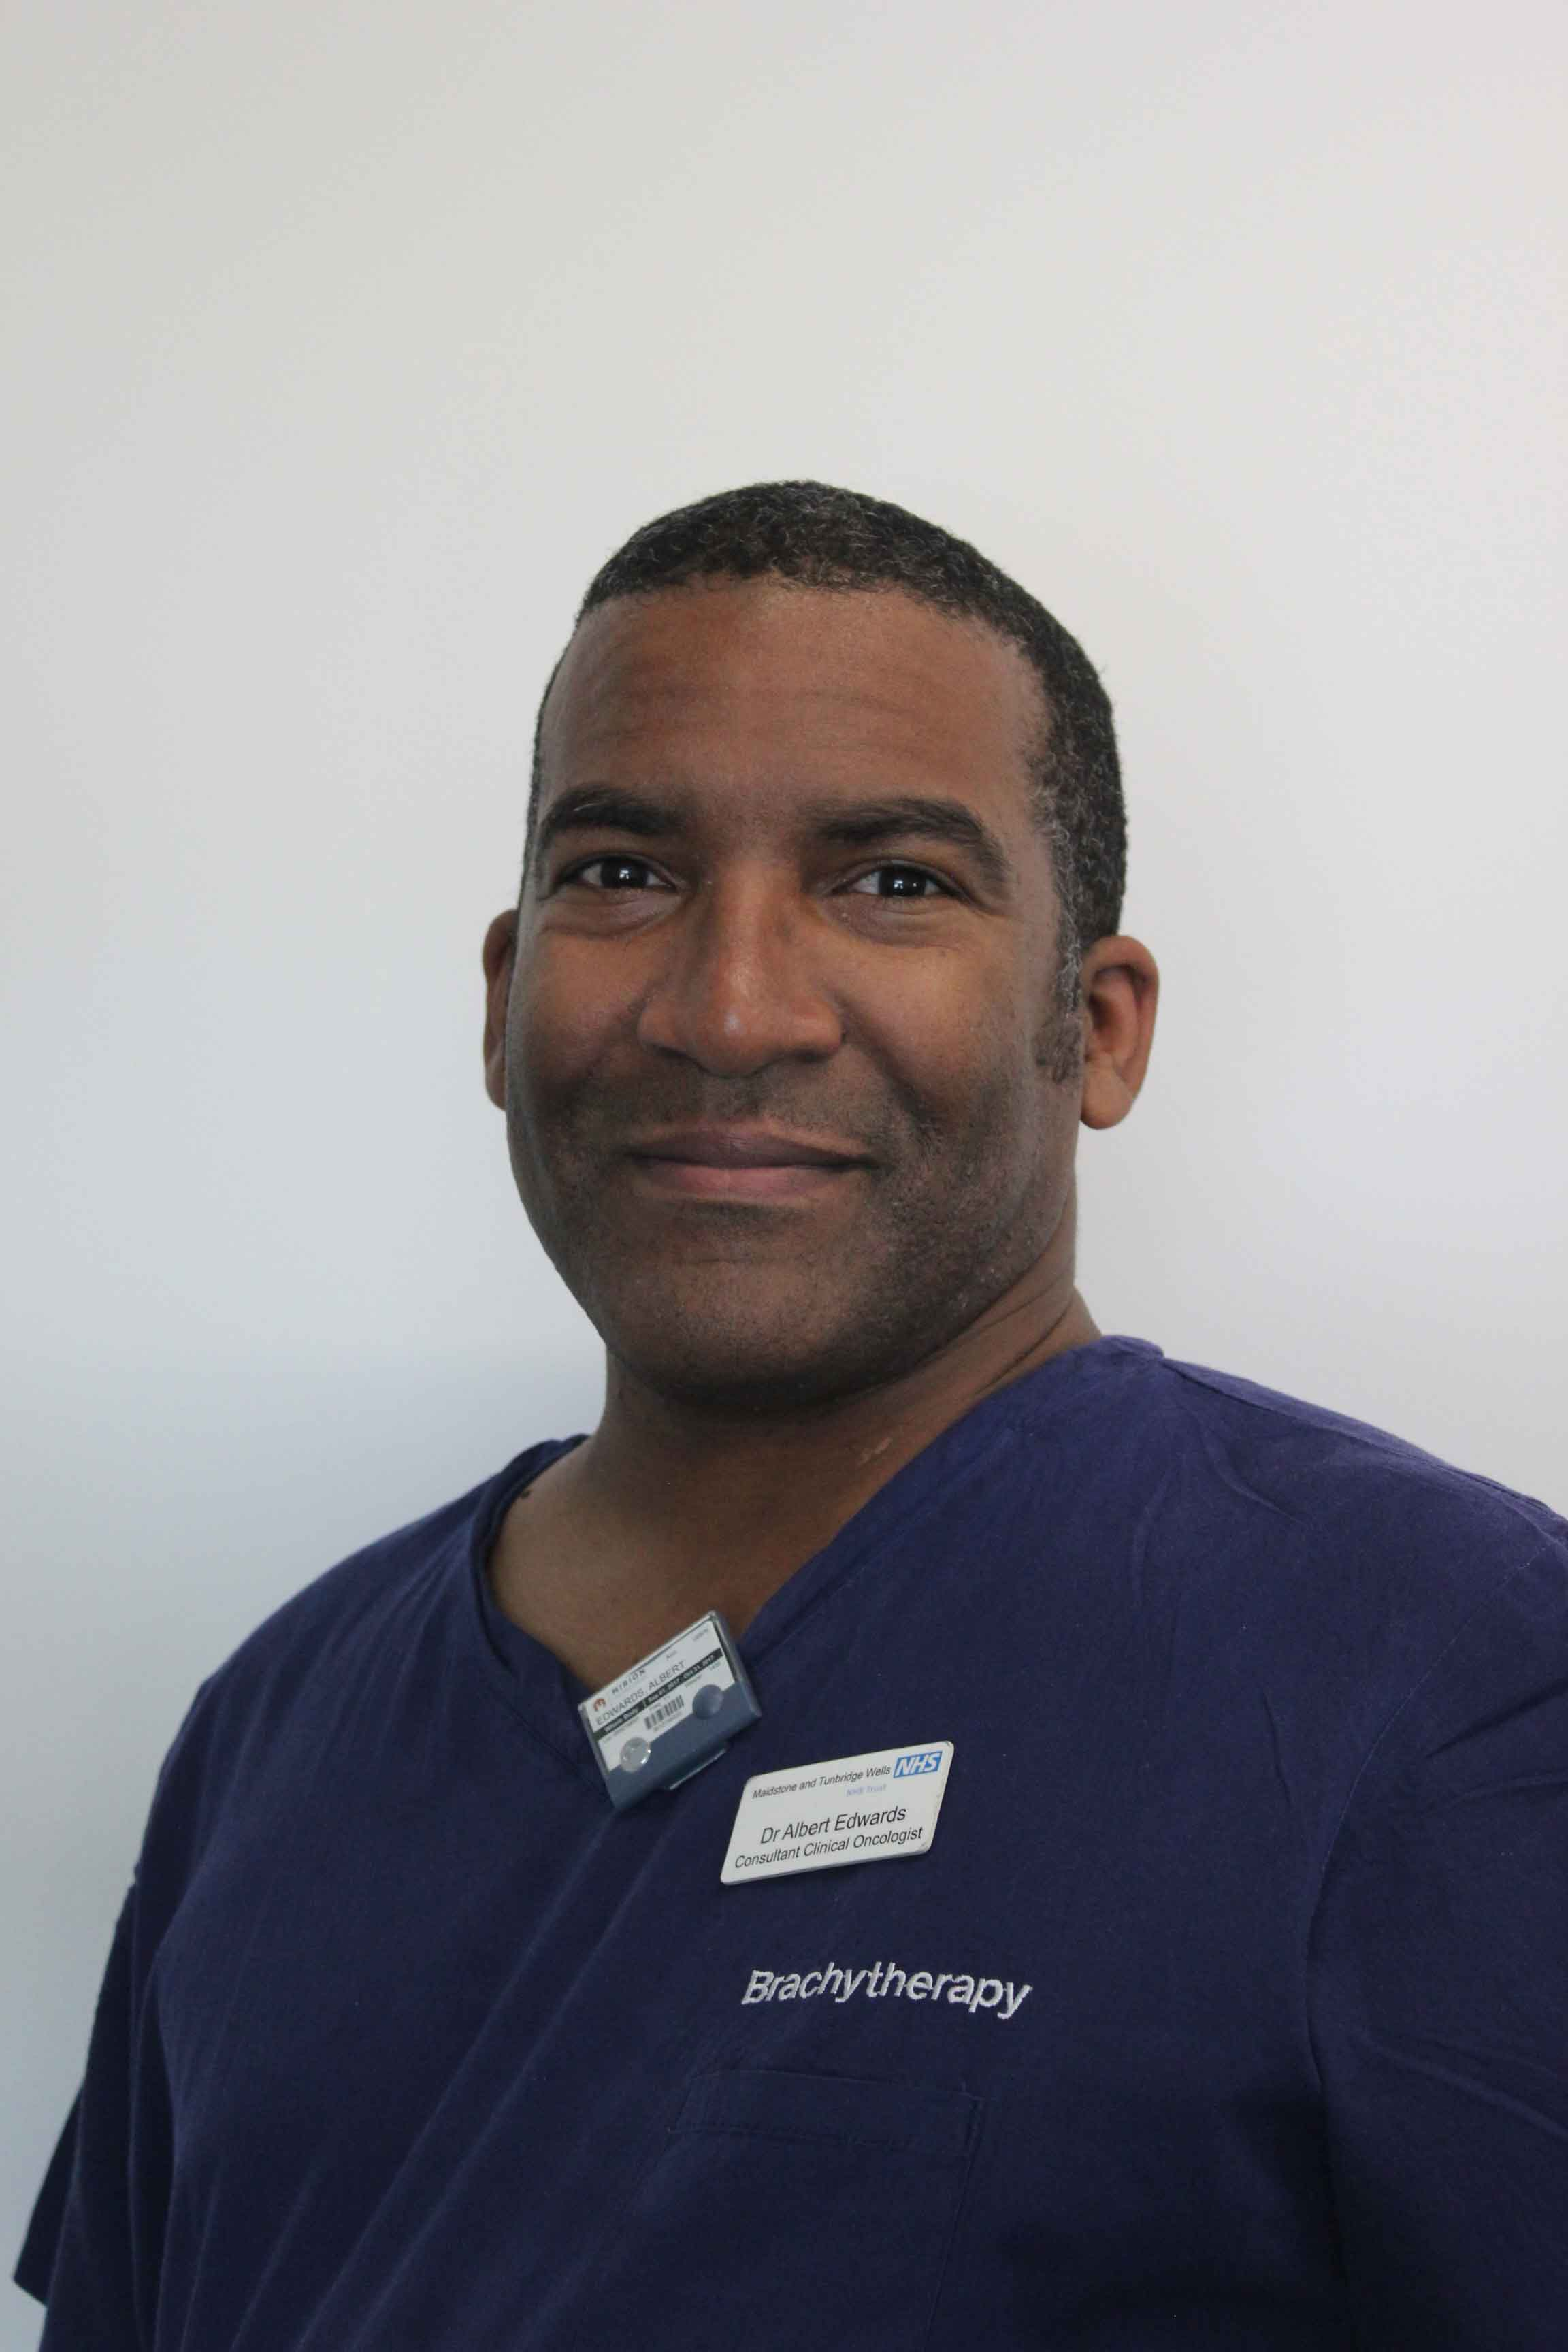 Dr Albert Edwards